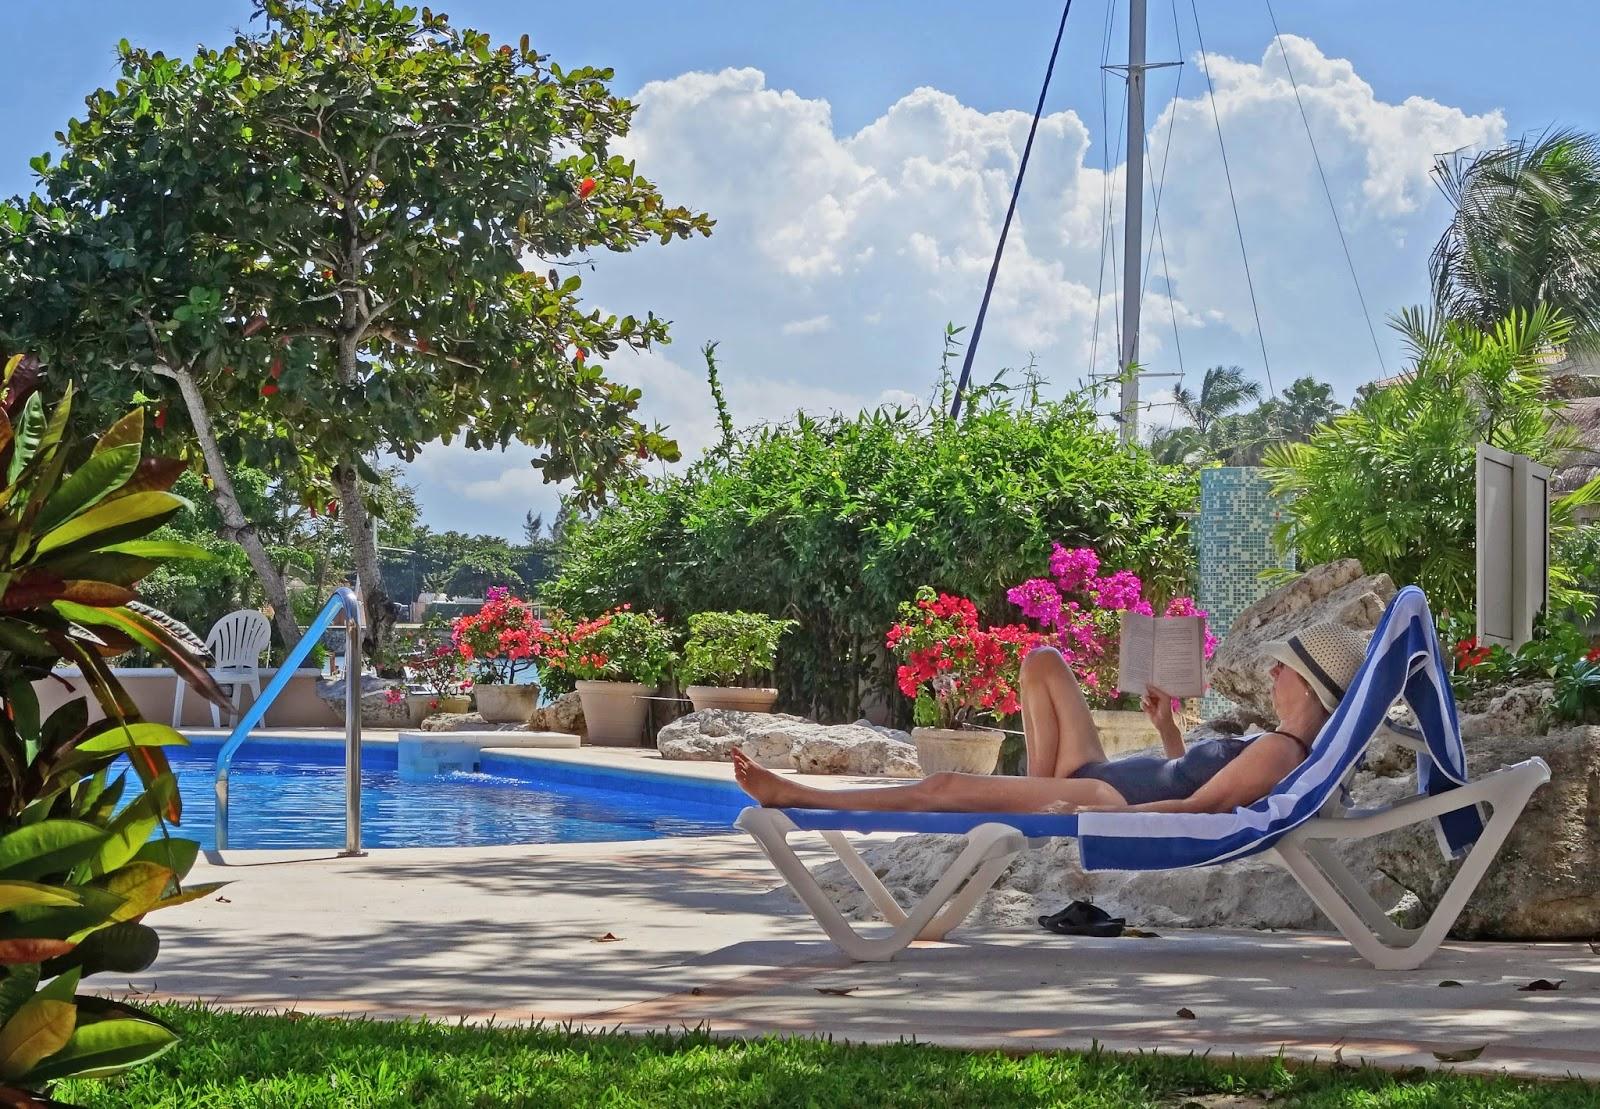 Mangos Lounge And Restaurant Myrtle Beach